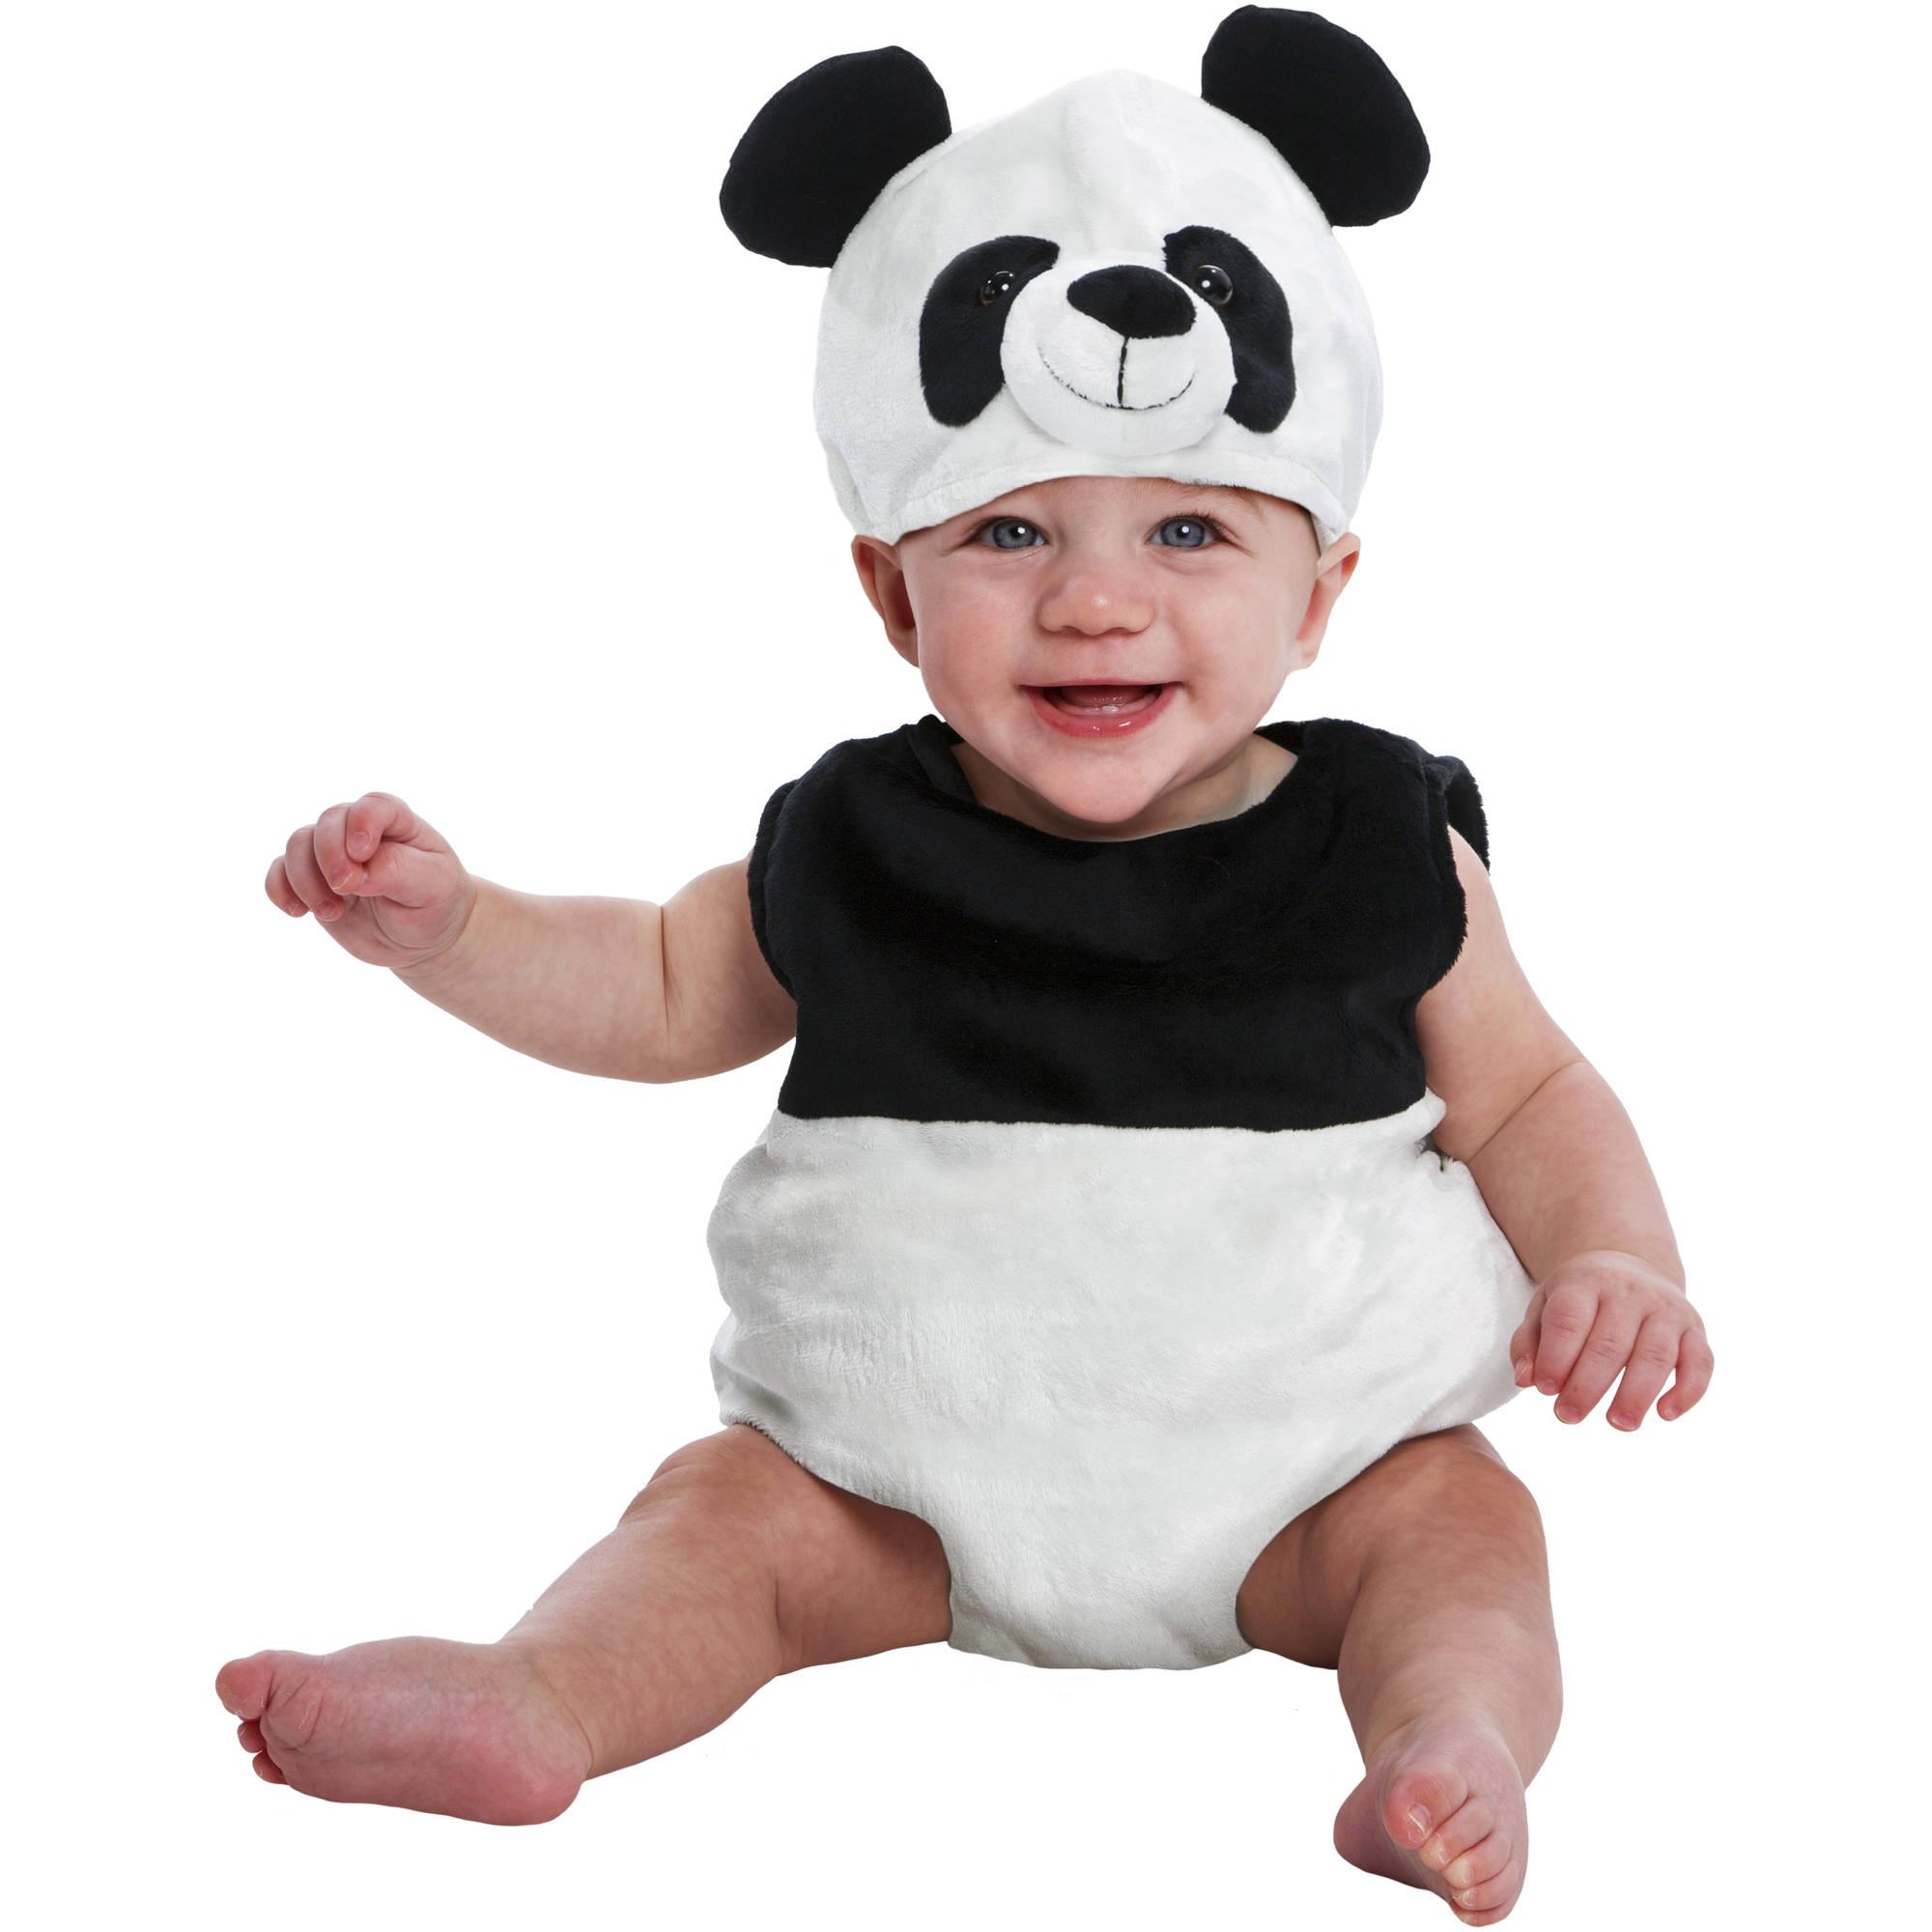 Panda Bubble Infant Halloween Dress Up / Role Play Costume